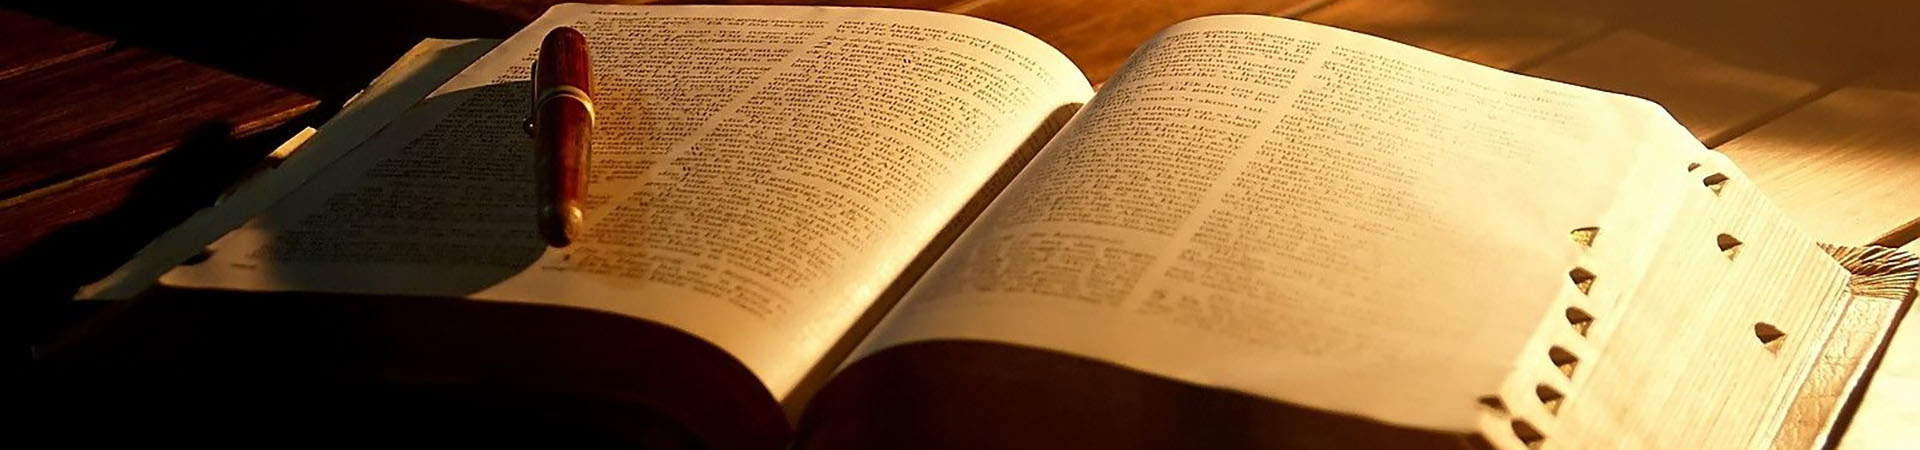 slider_bible